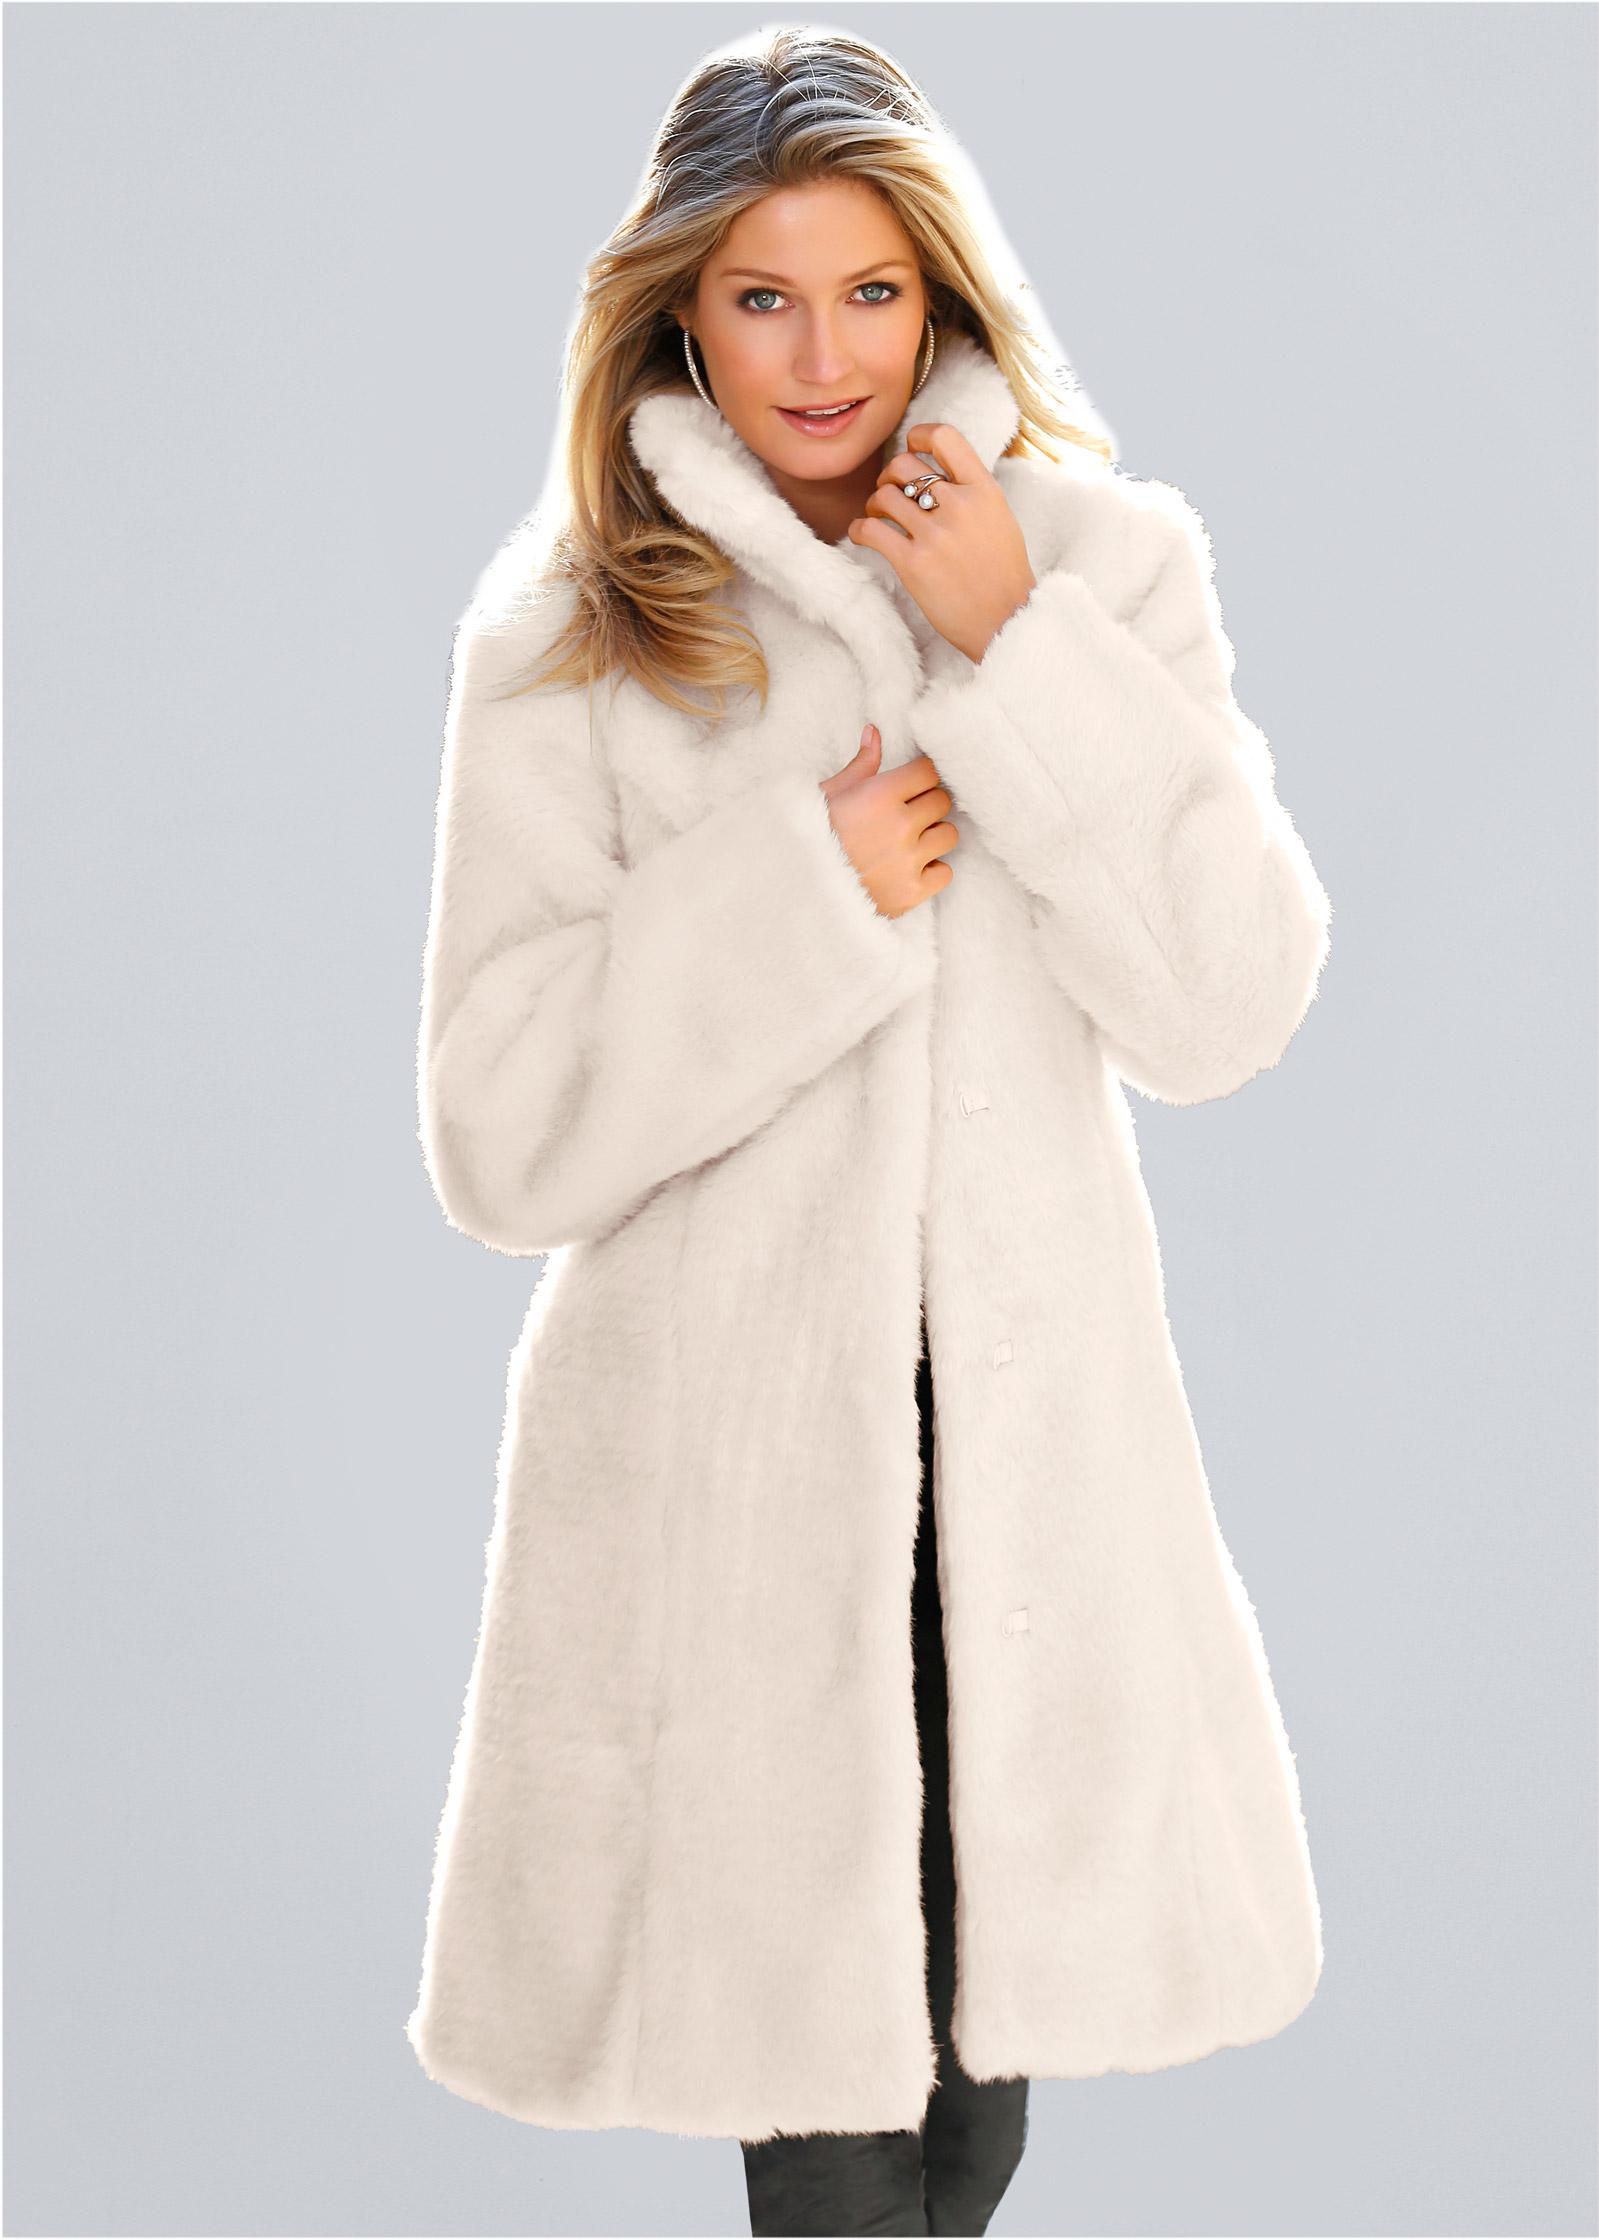 Glamour Girl Wallpaper Faux Fur Coat In White Venus